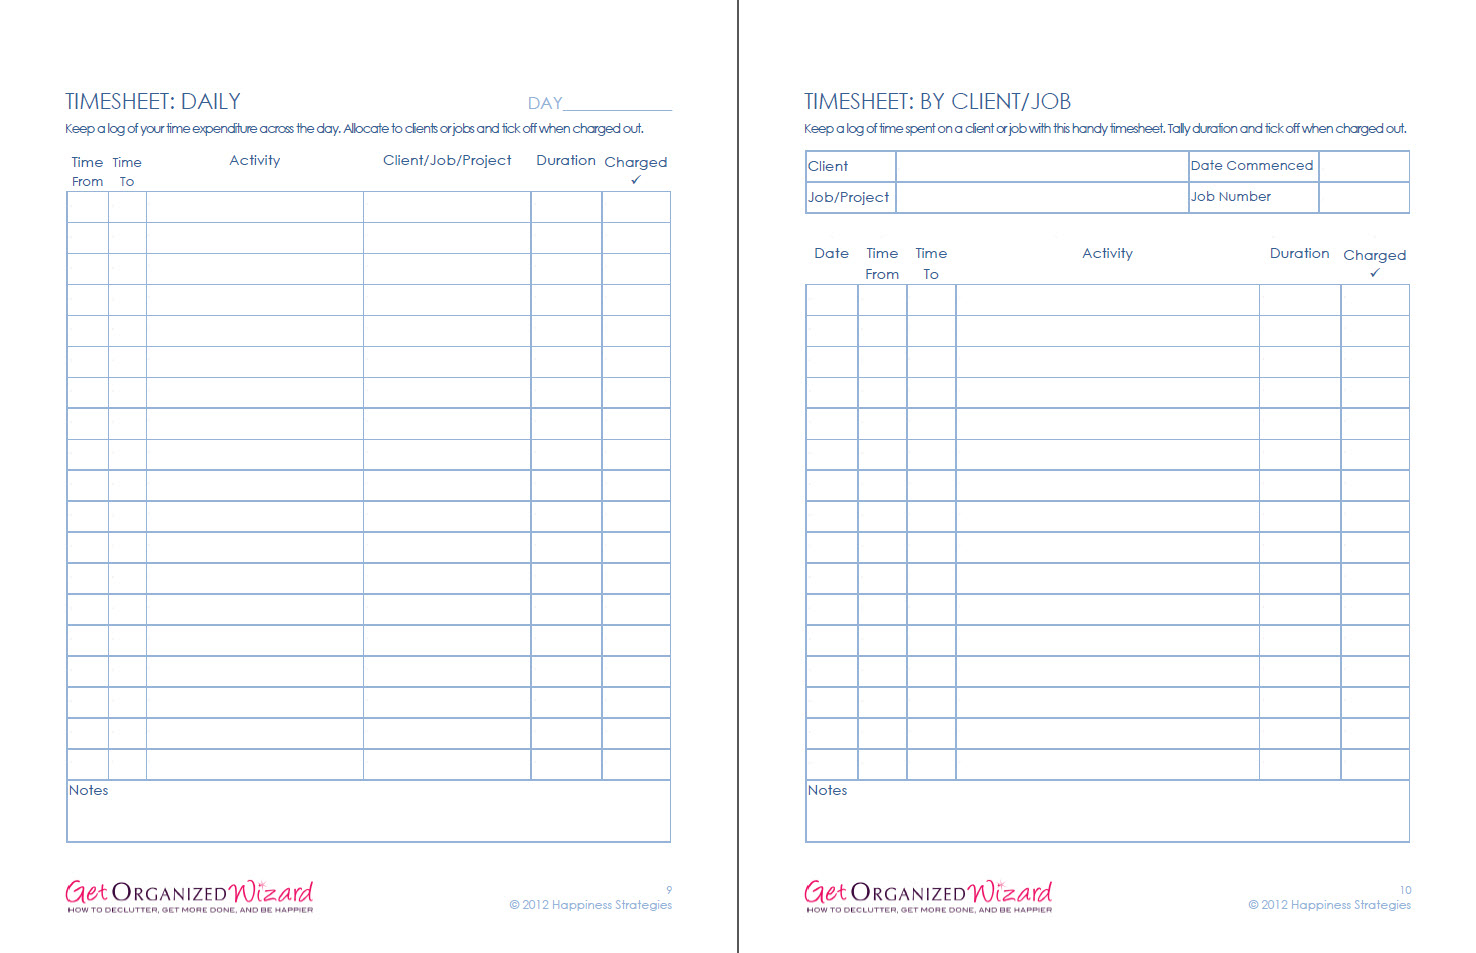 Business & Marketing Worksheets - Get Organized Wizard | Business Worksheets Printables